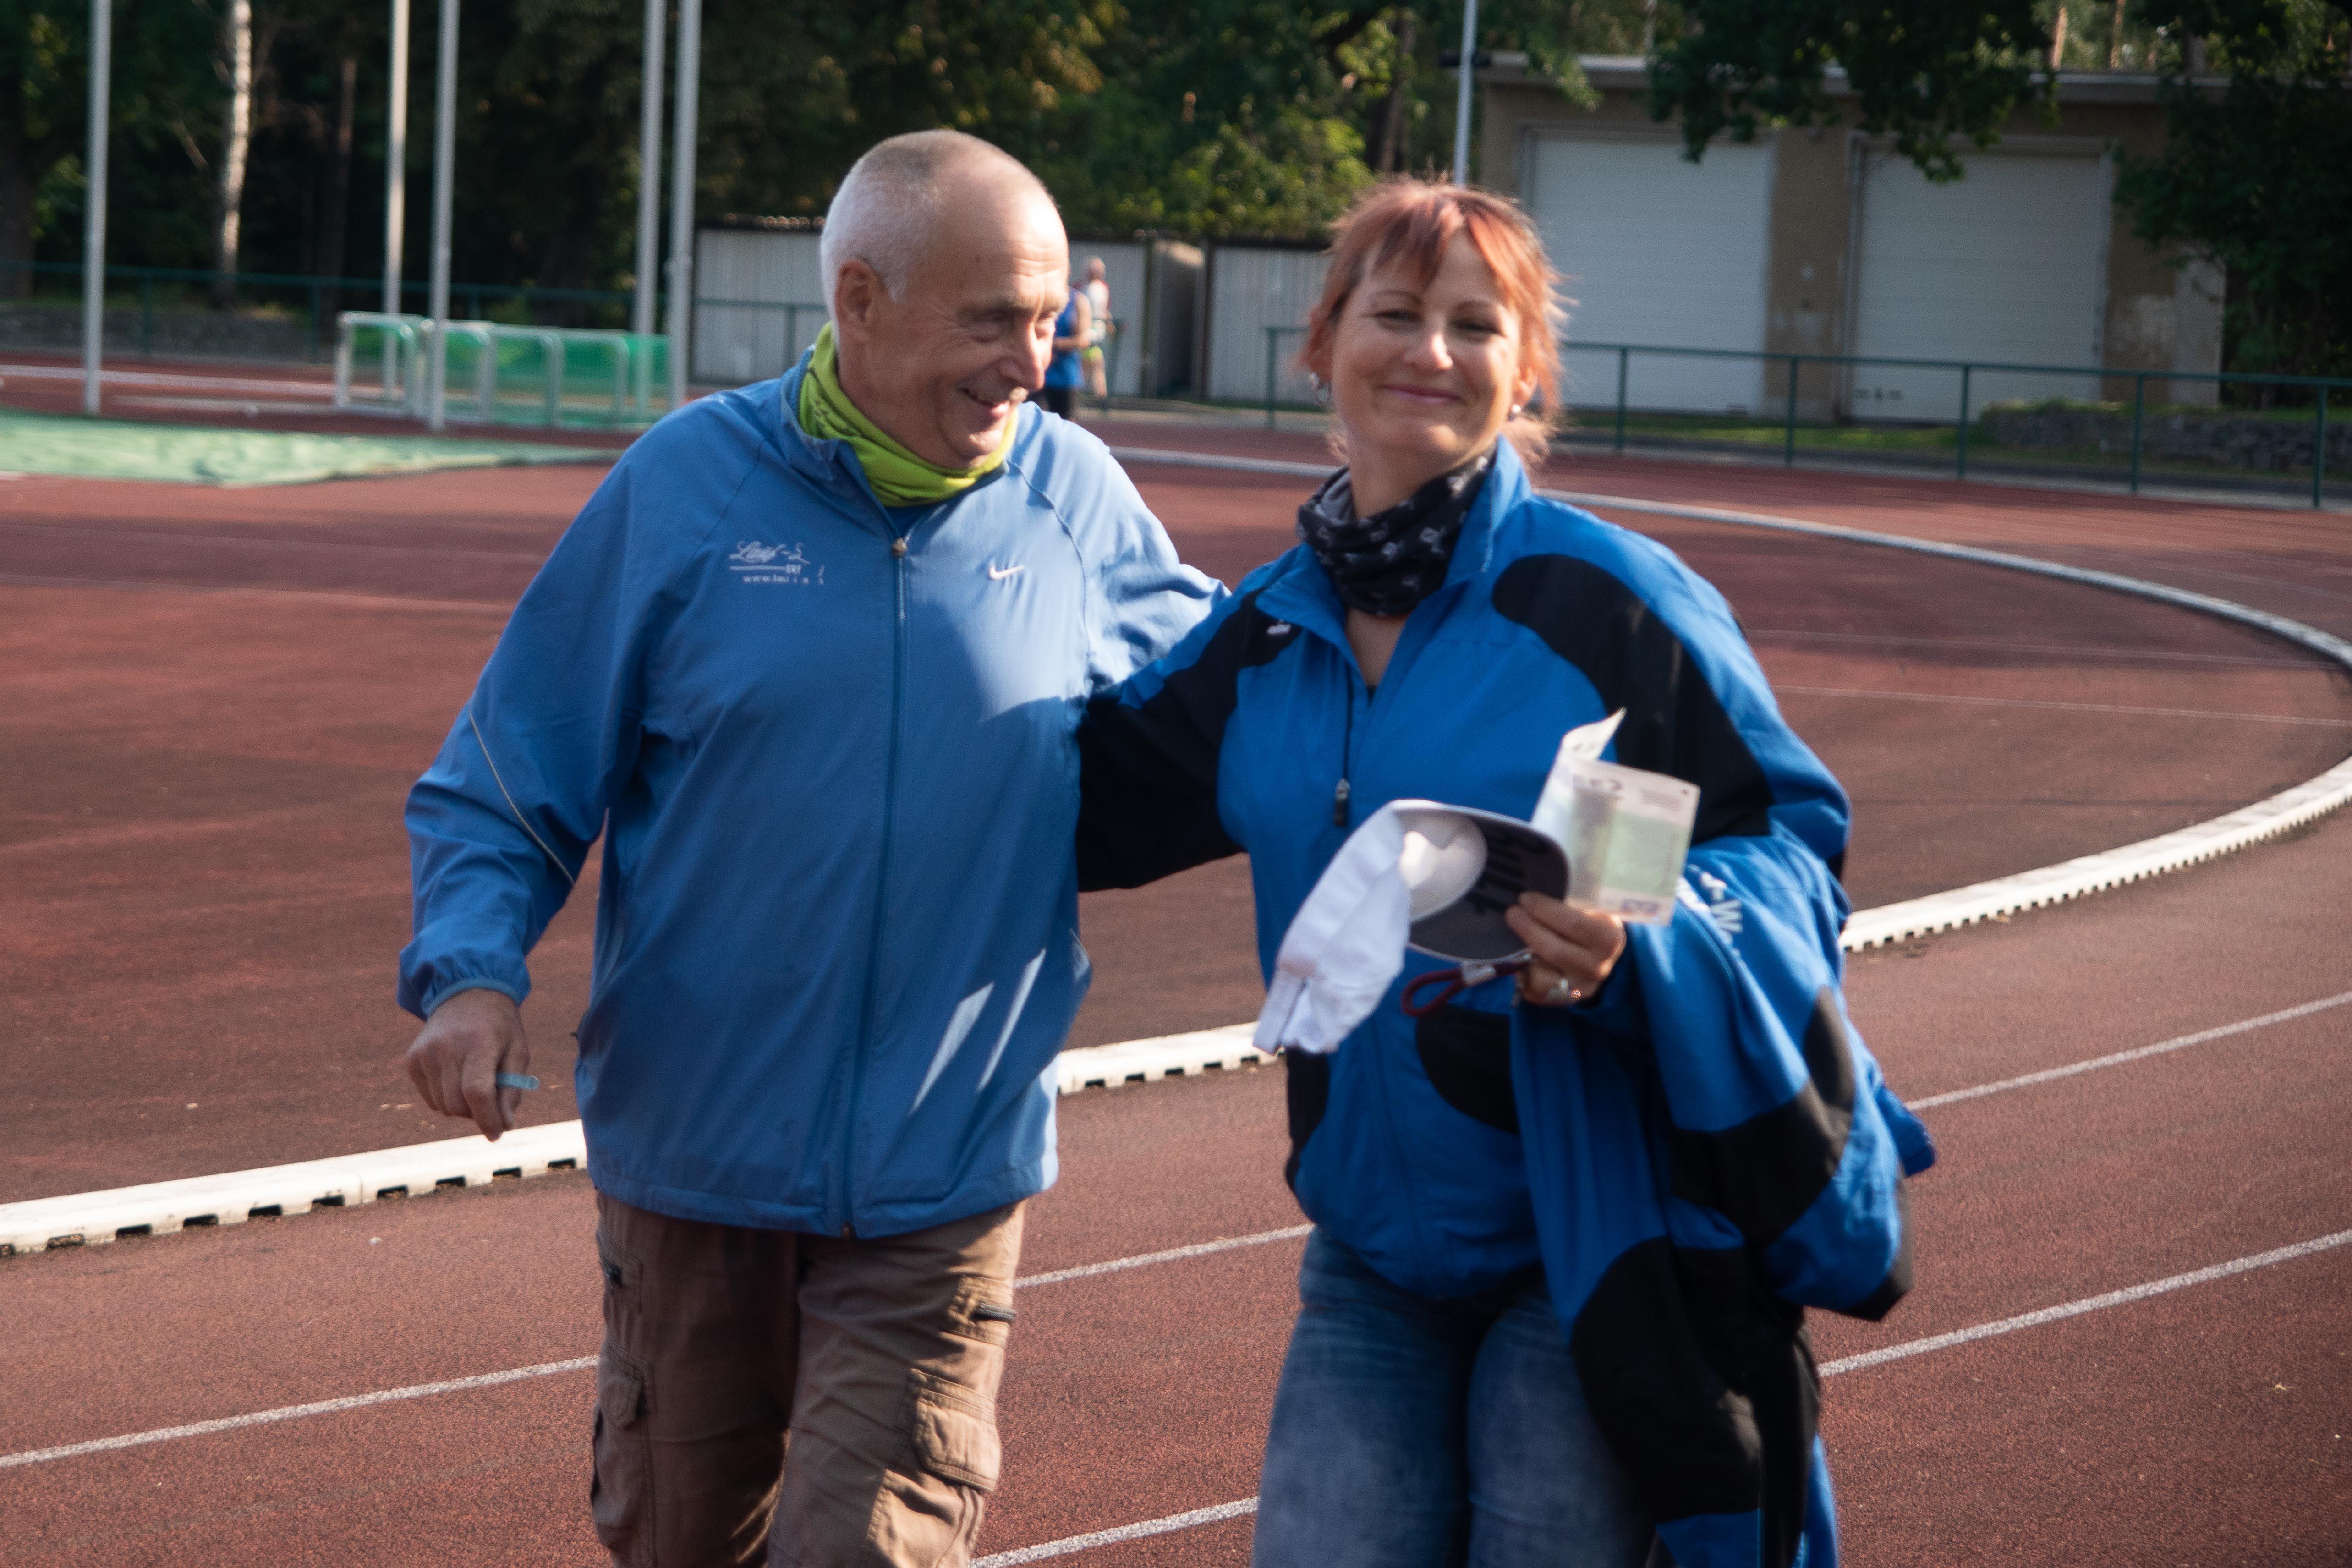 44.-Holzlandlauf-12.-September-2020-0063